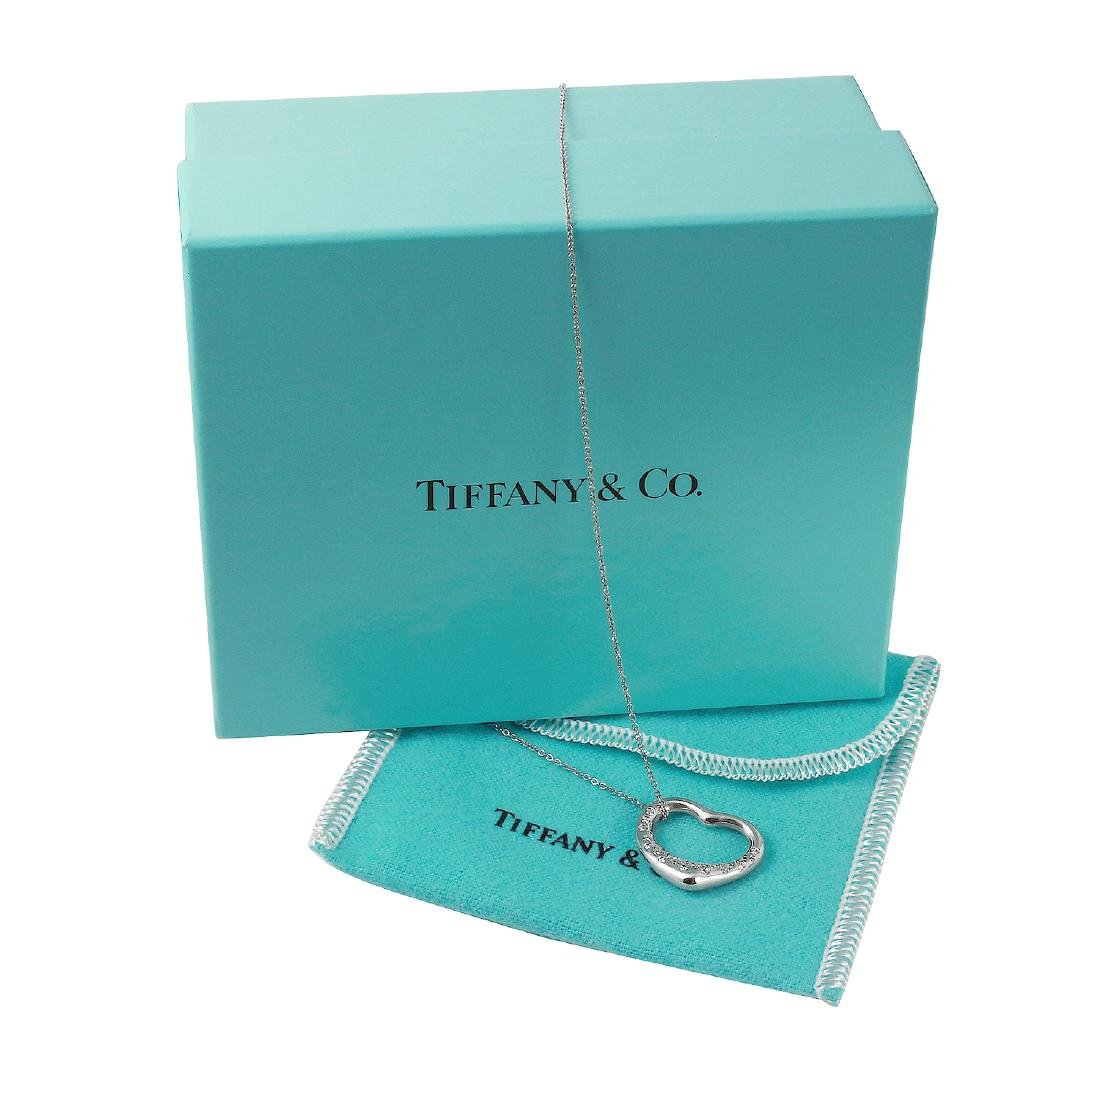 Tiffany & Co. Elsa Peretti Platinum Necklace